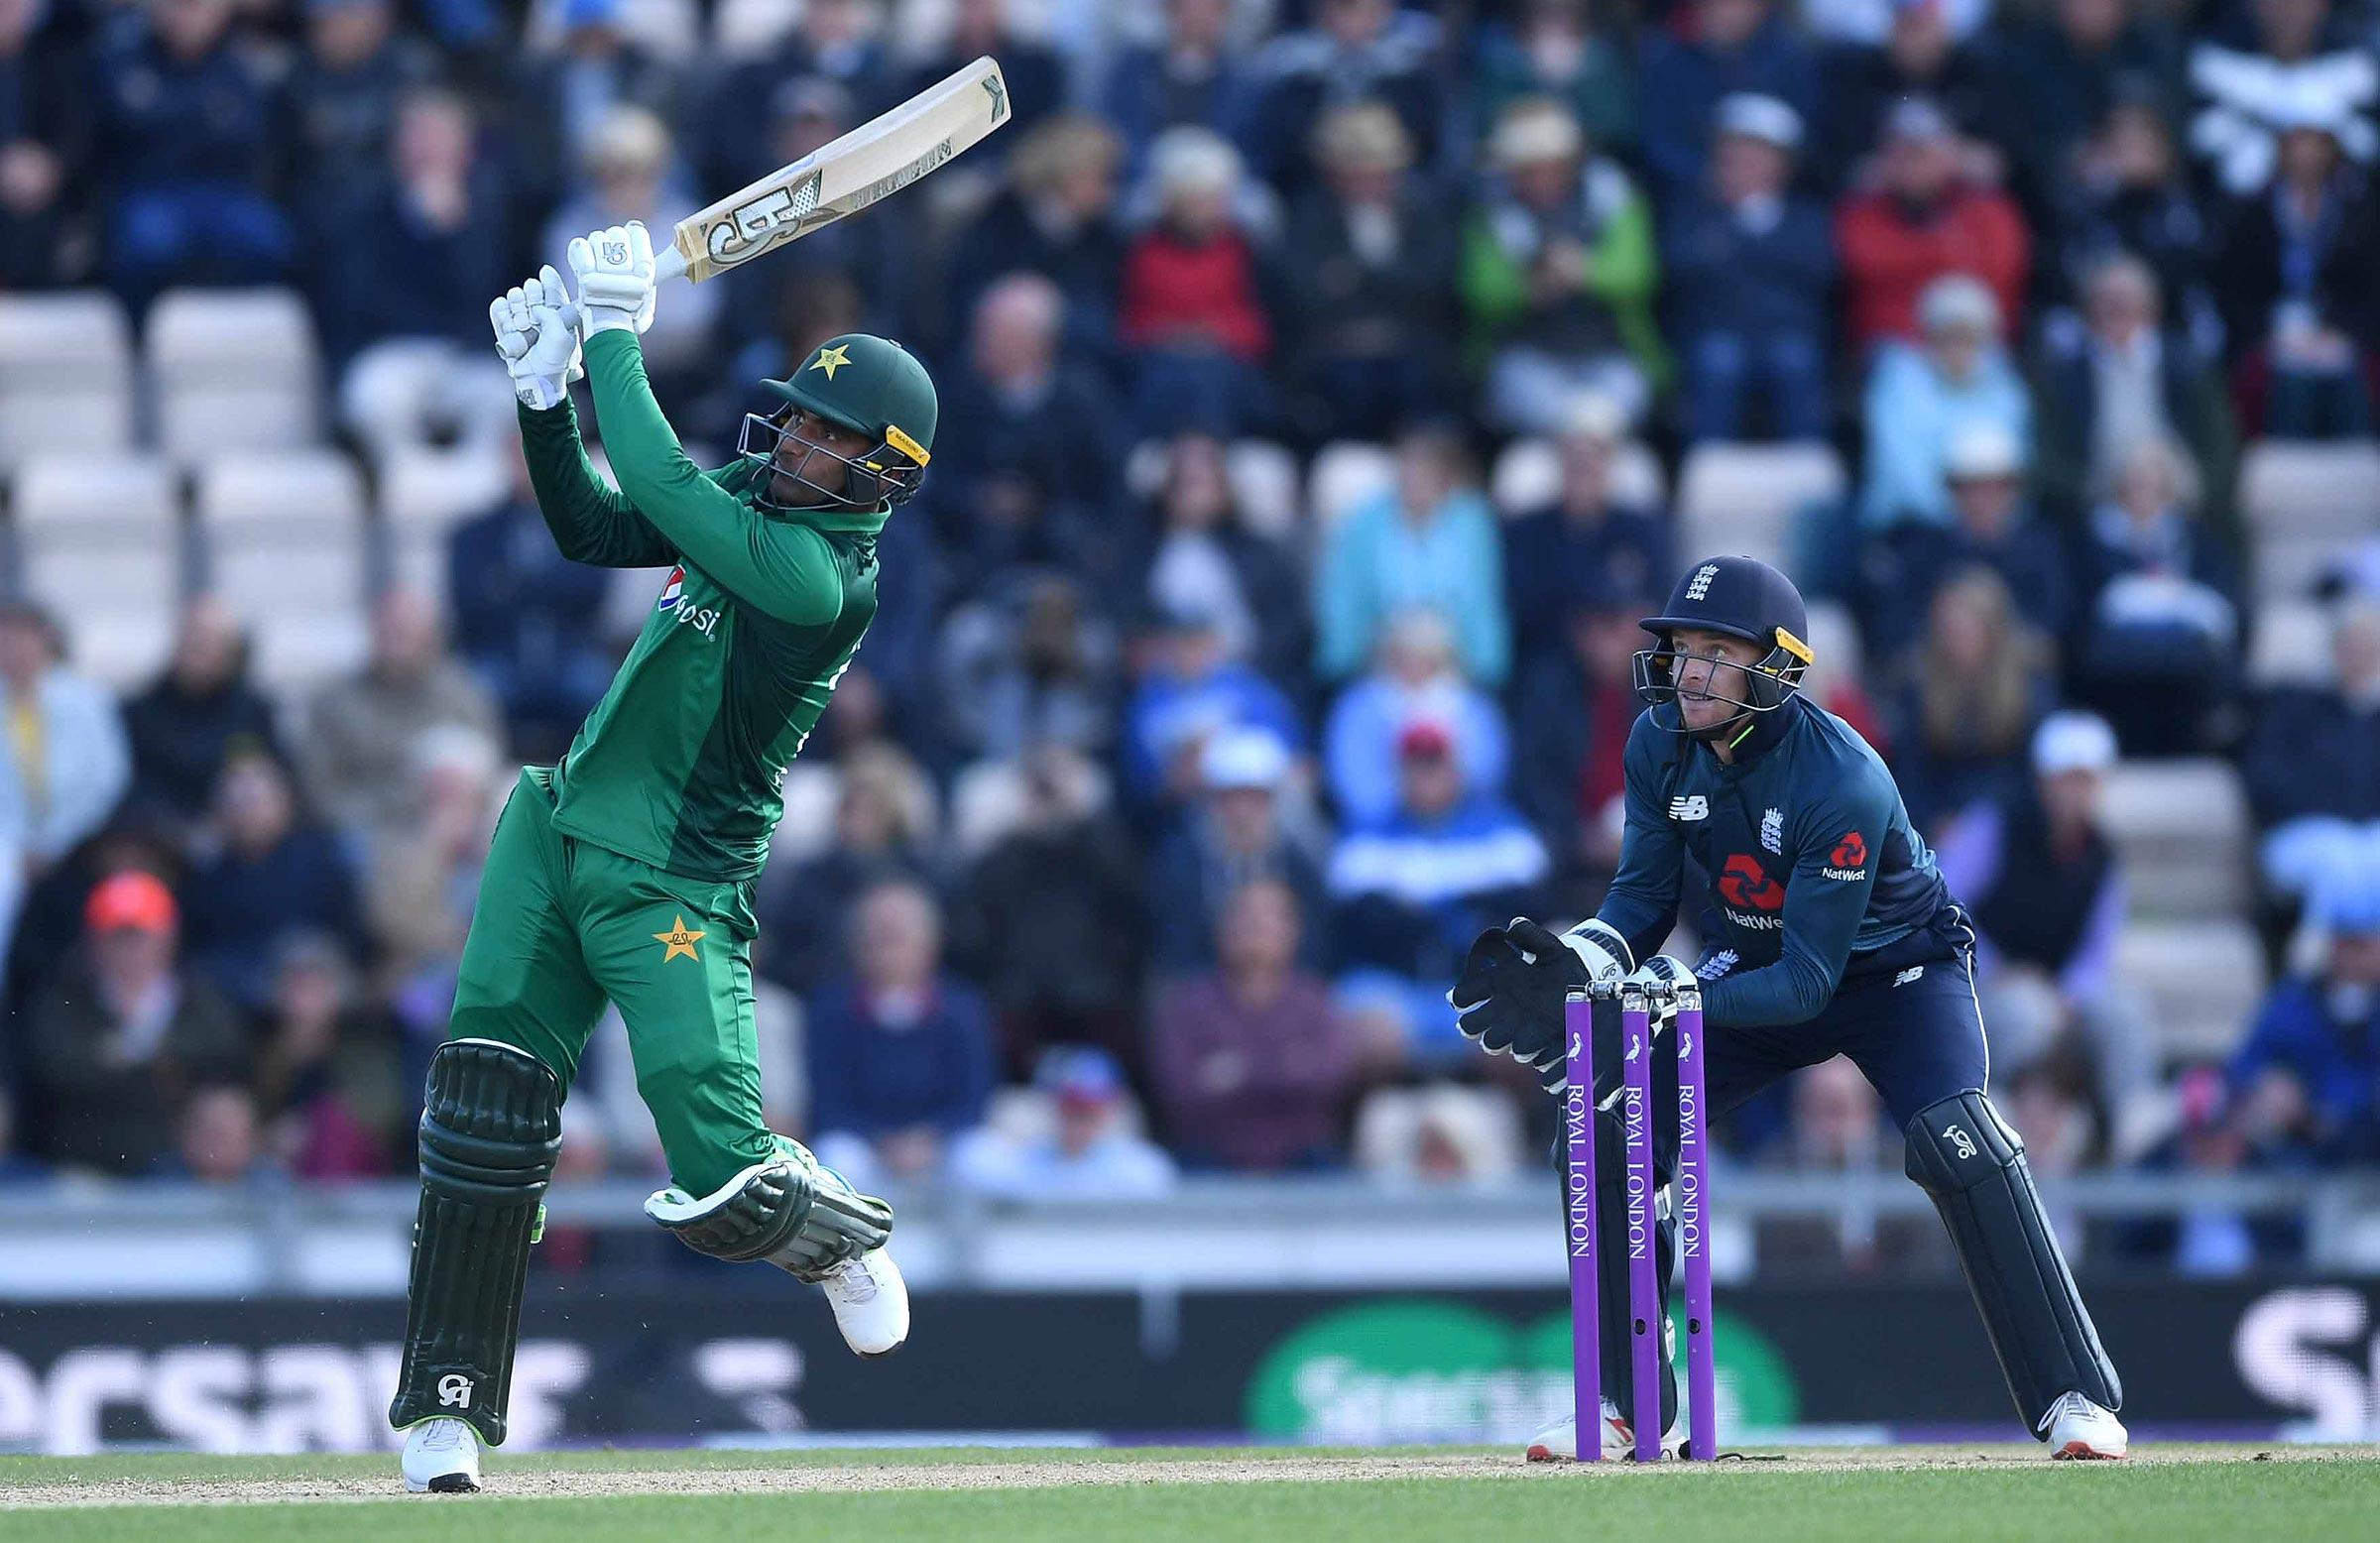 Fakhar Zaman gave Pakistan a chance of victory // Getty